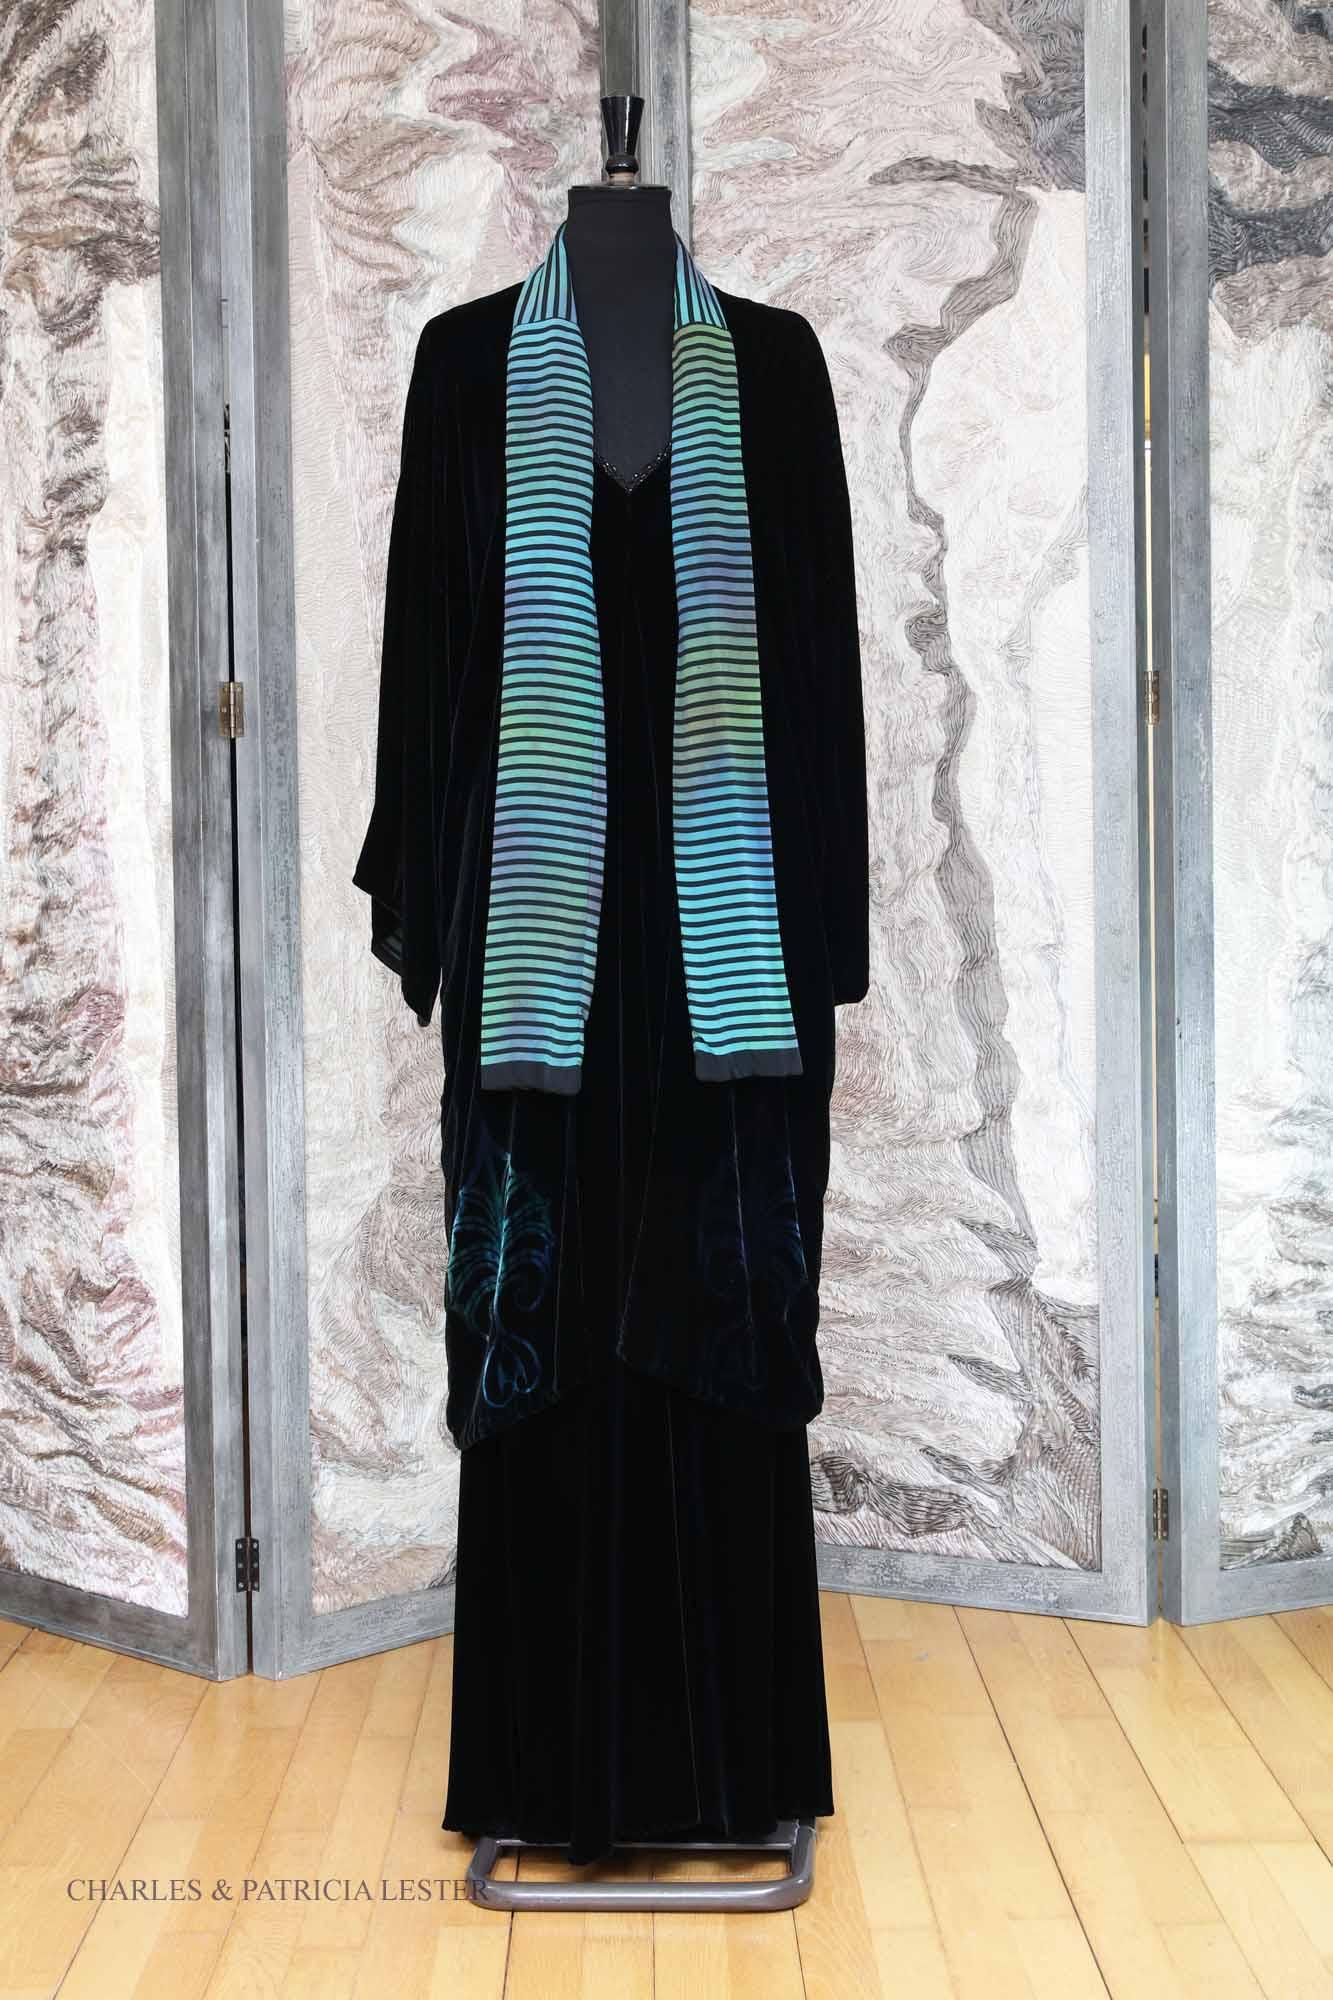 Scarf Coat with Tie in Black and Peacock Velvet with Stripe Phantom Print